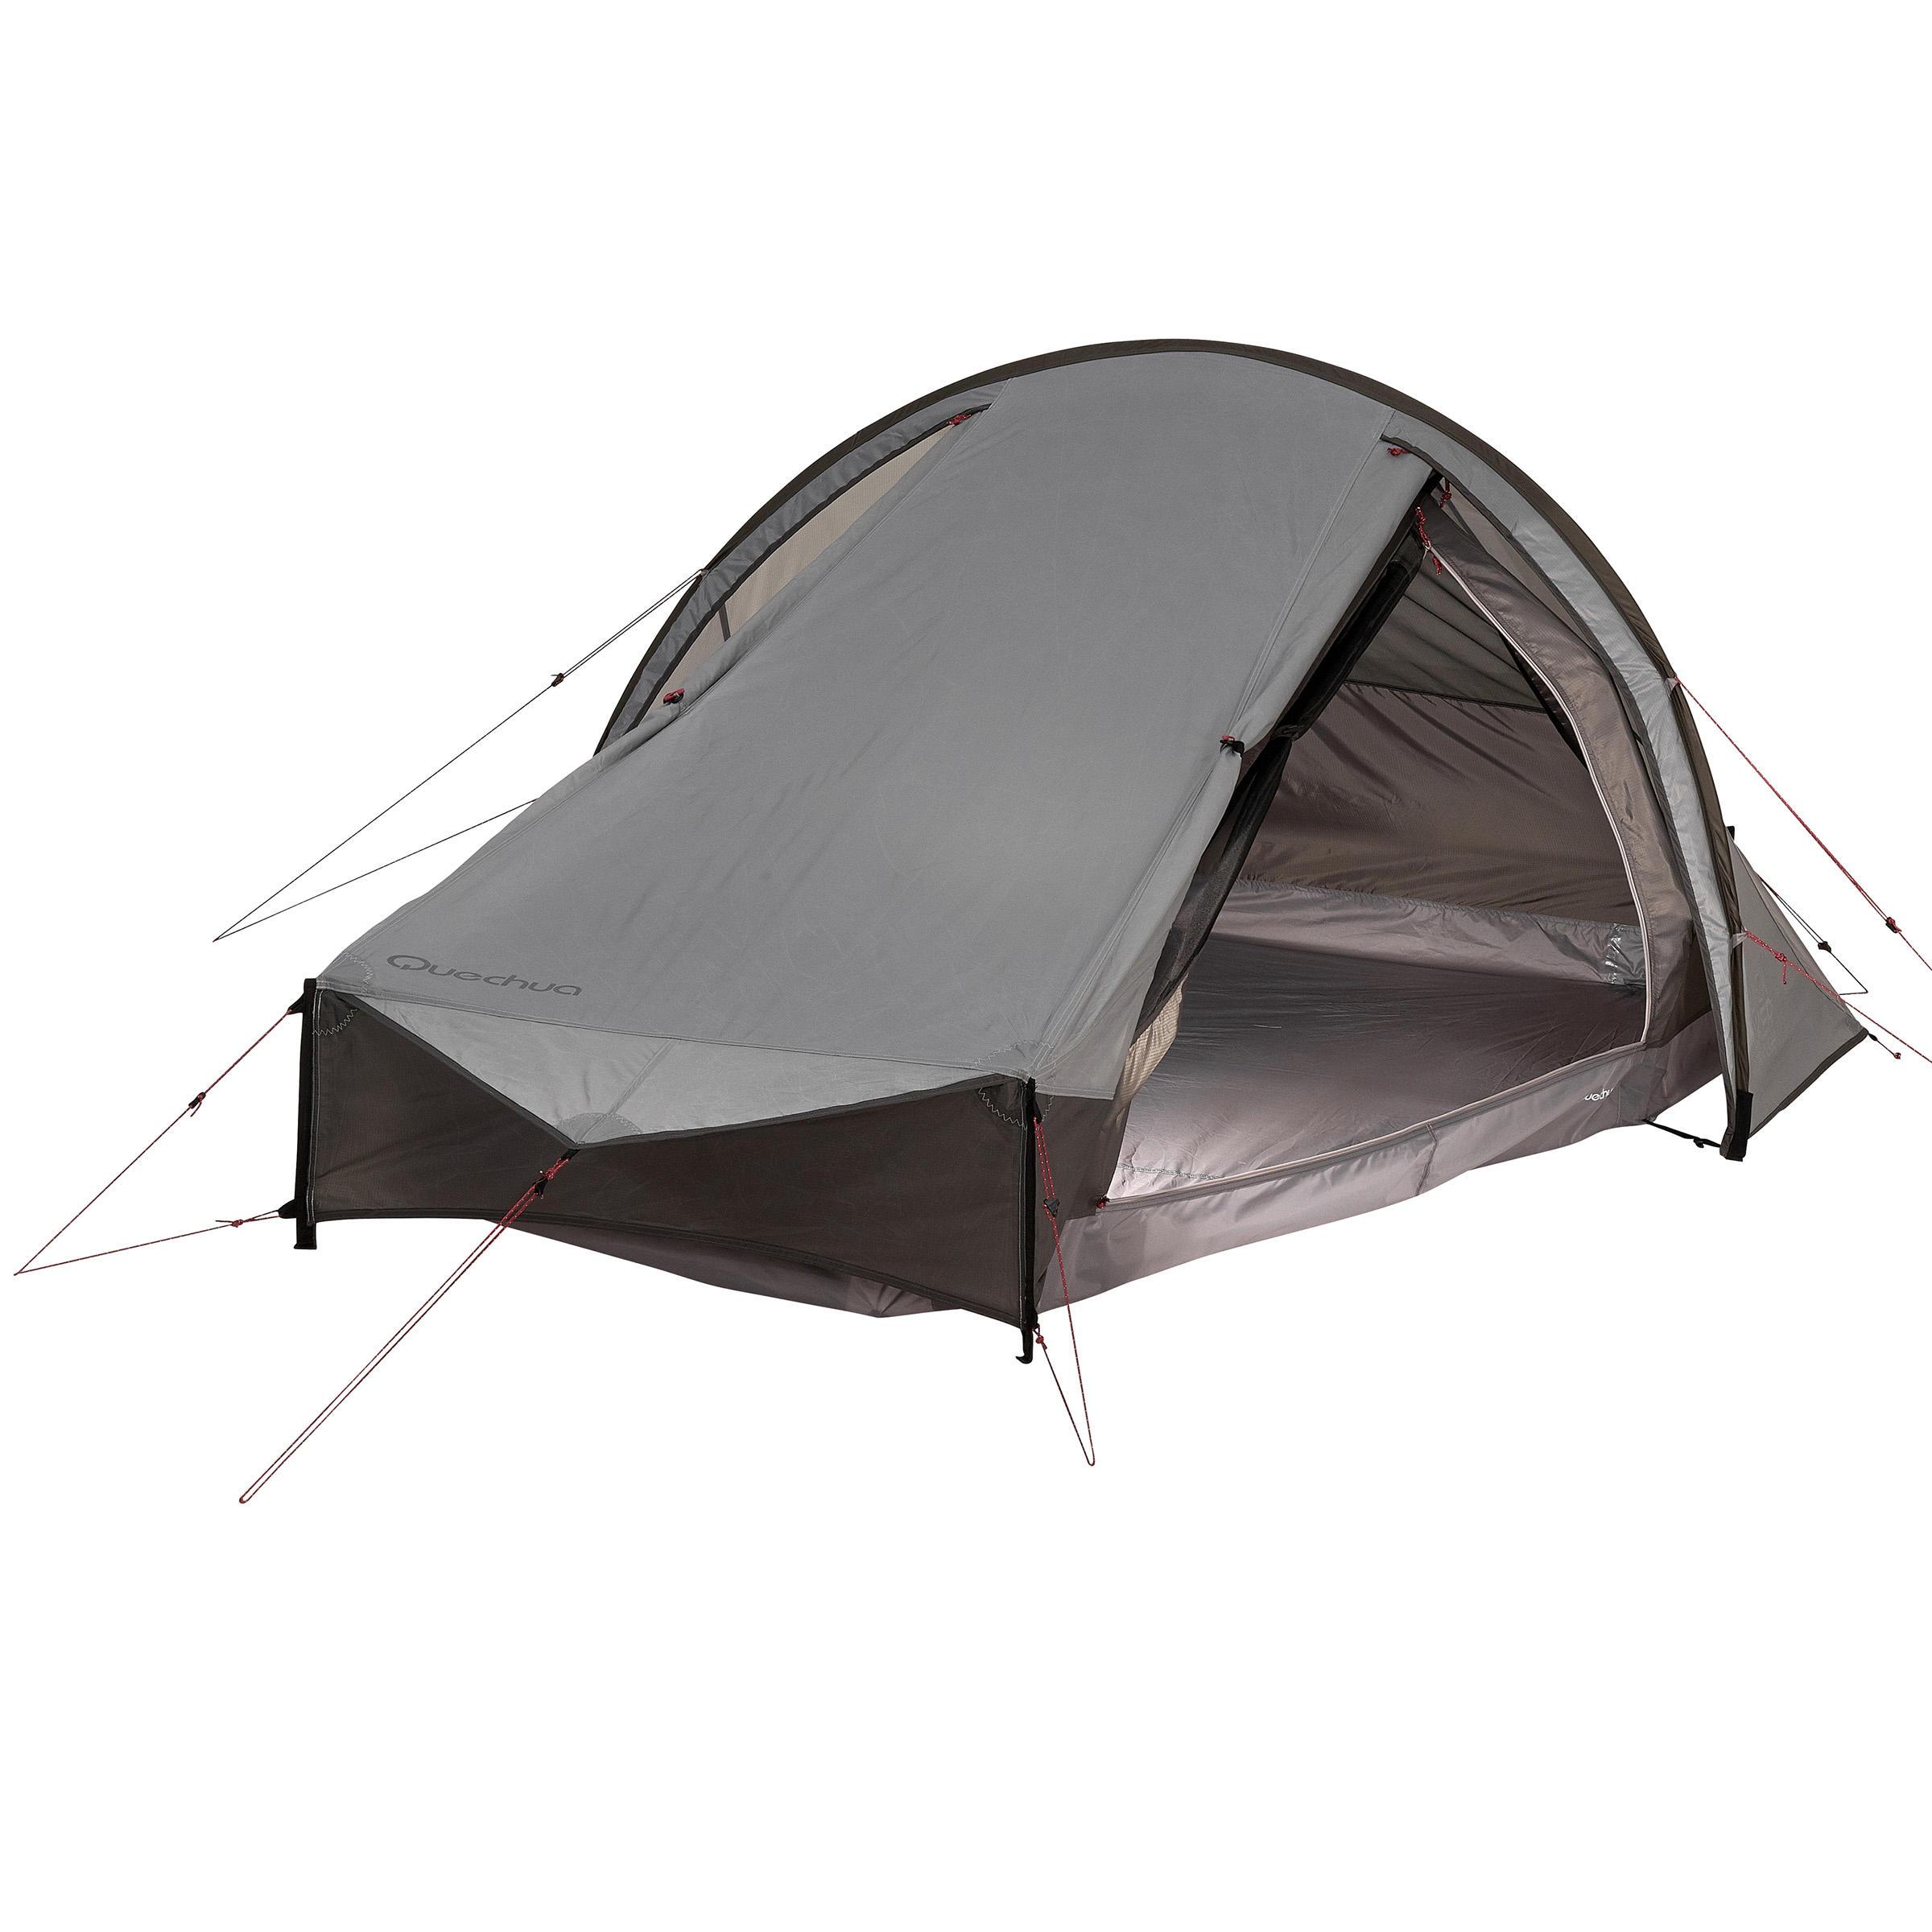 Tente de trek Quickhiker Ultralight 2 personnes gris clair